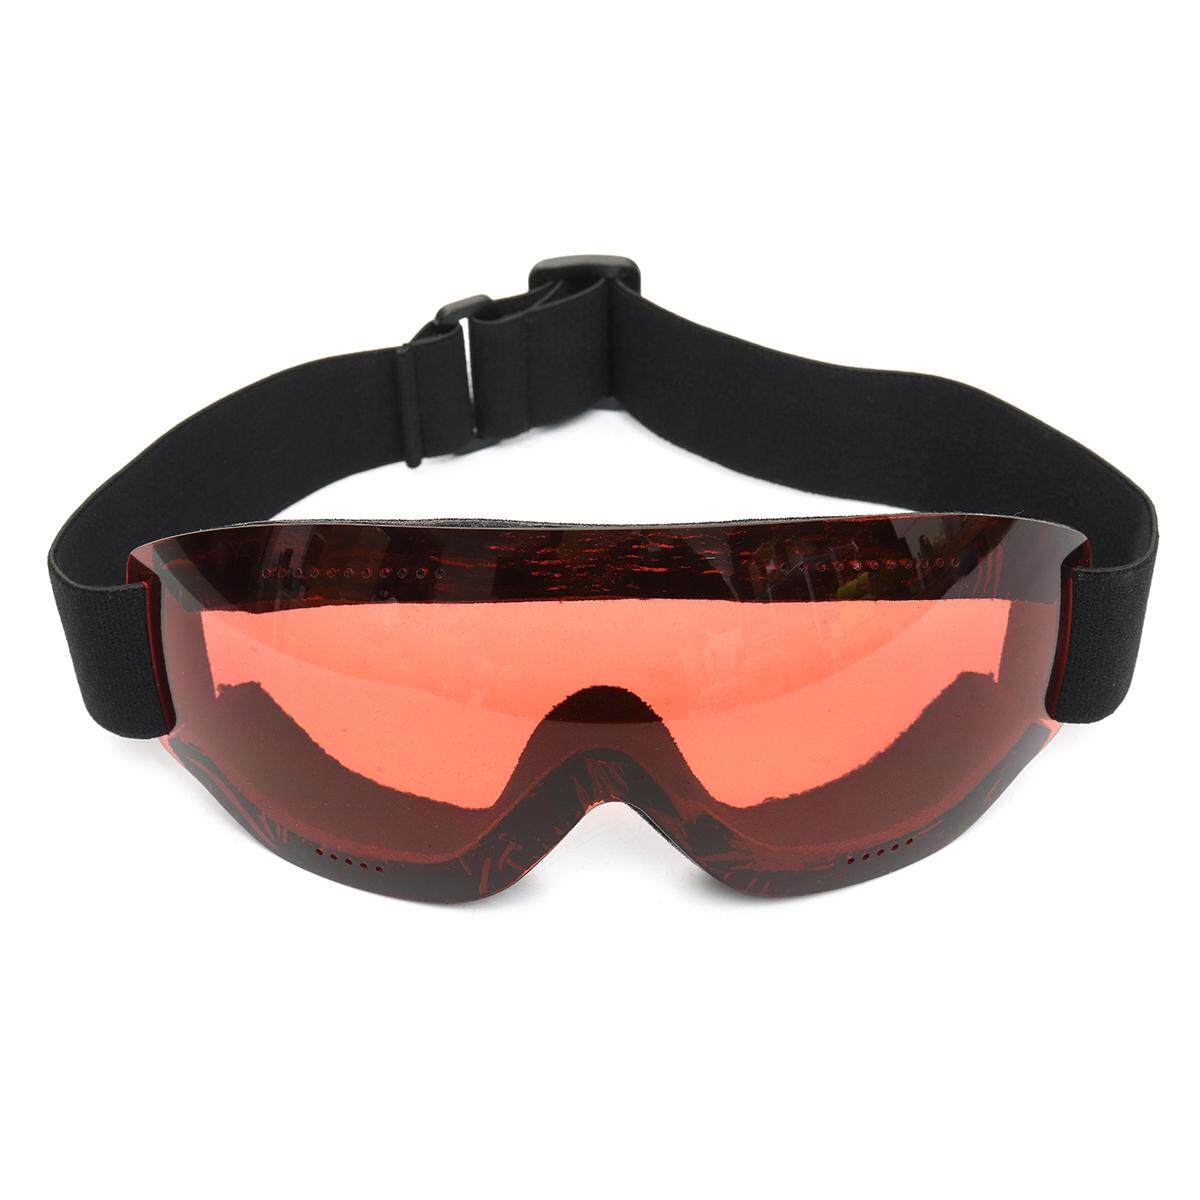 Frameless Anti-fog UV Protection Ski Glasses Skiing Goggles Snowboard Unisex Pink